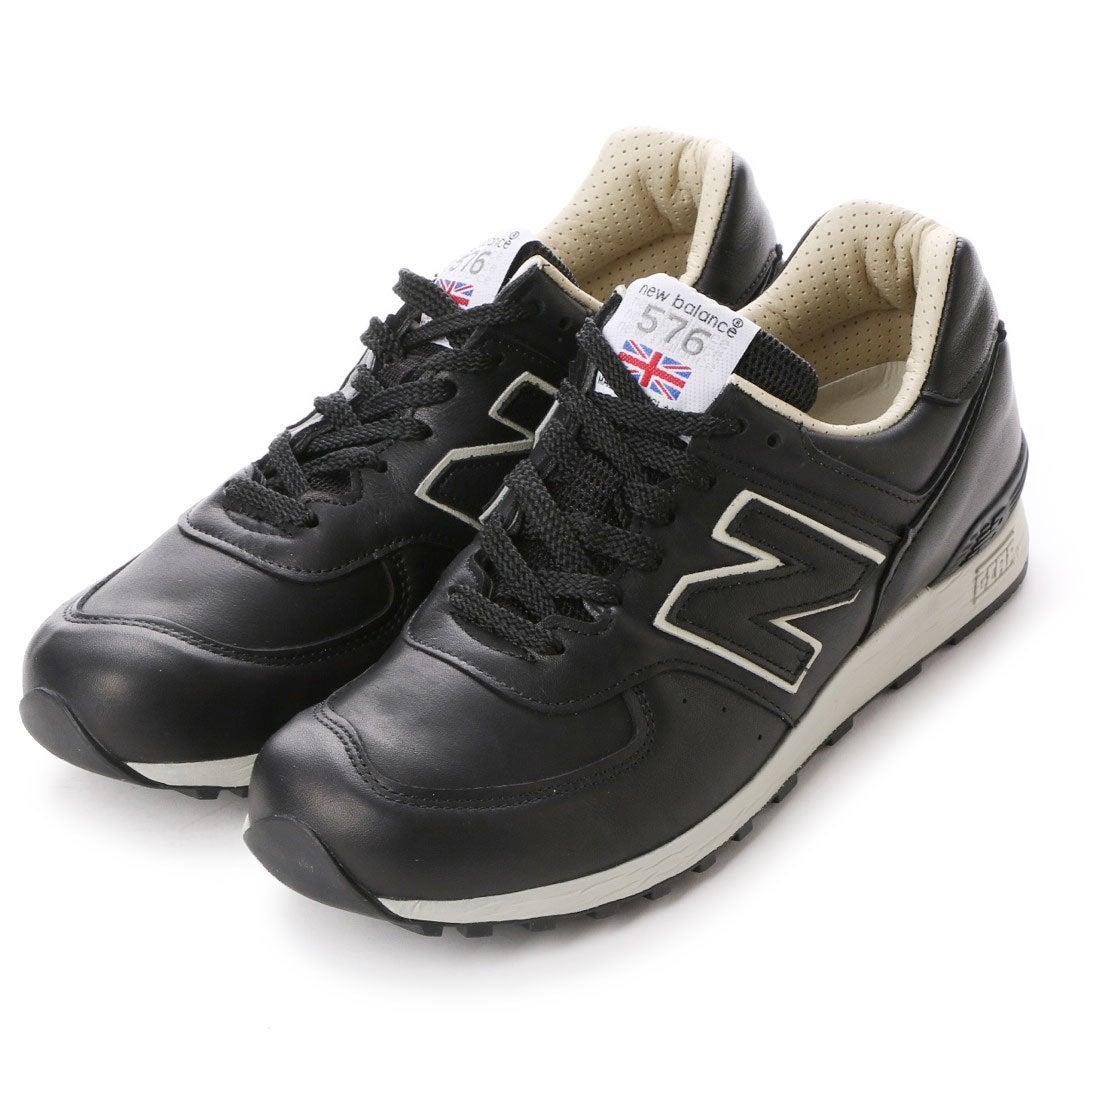 1dac3c12ca98d ニューバランス new balance atmos M576 (CKK) ブラック/ベージュ -靴&ファッション通販 ロコンド〜自宅で試着、気軽に返品